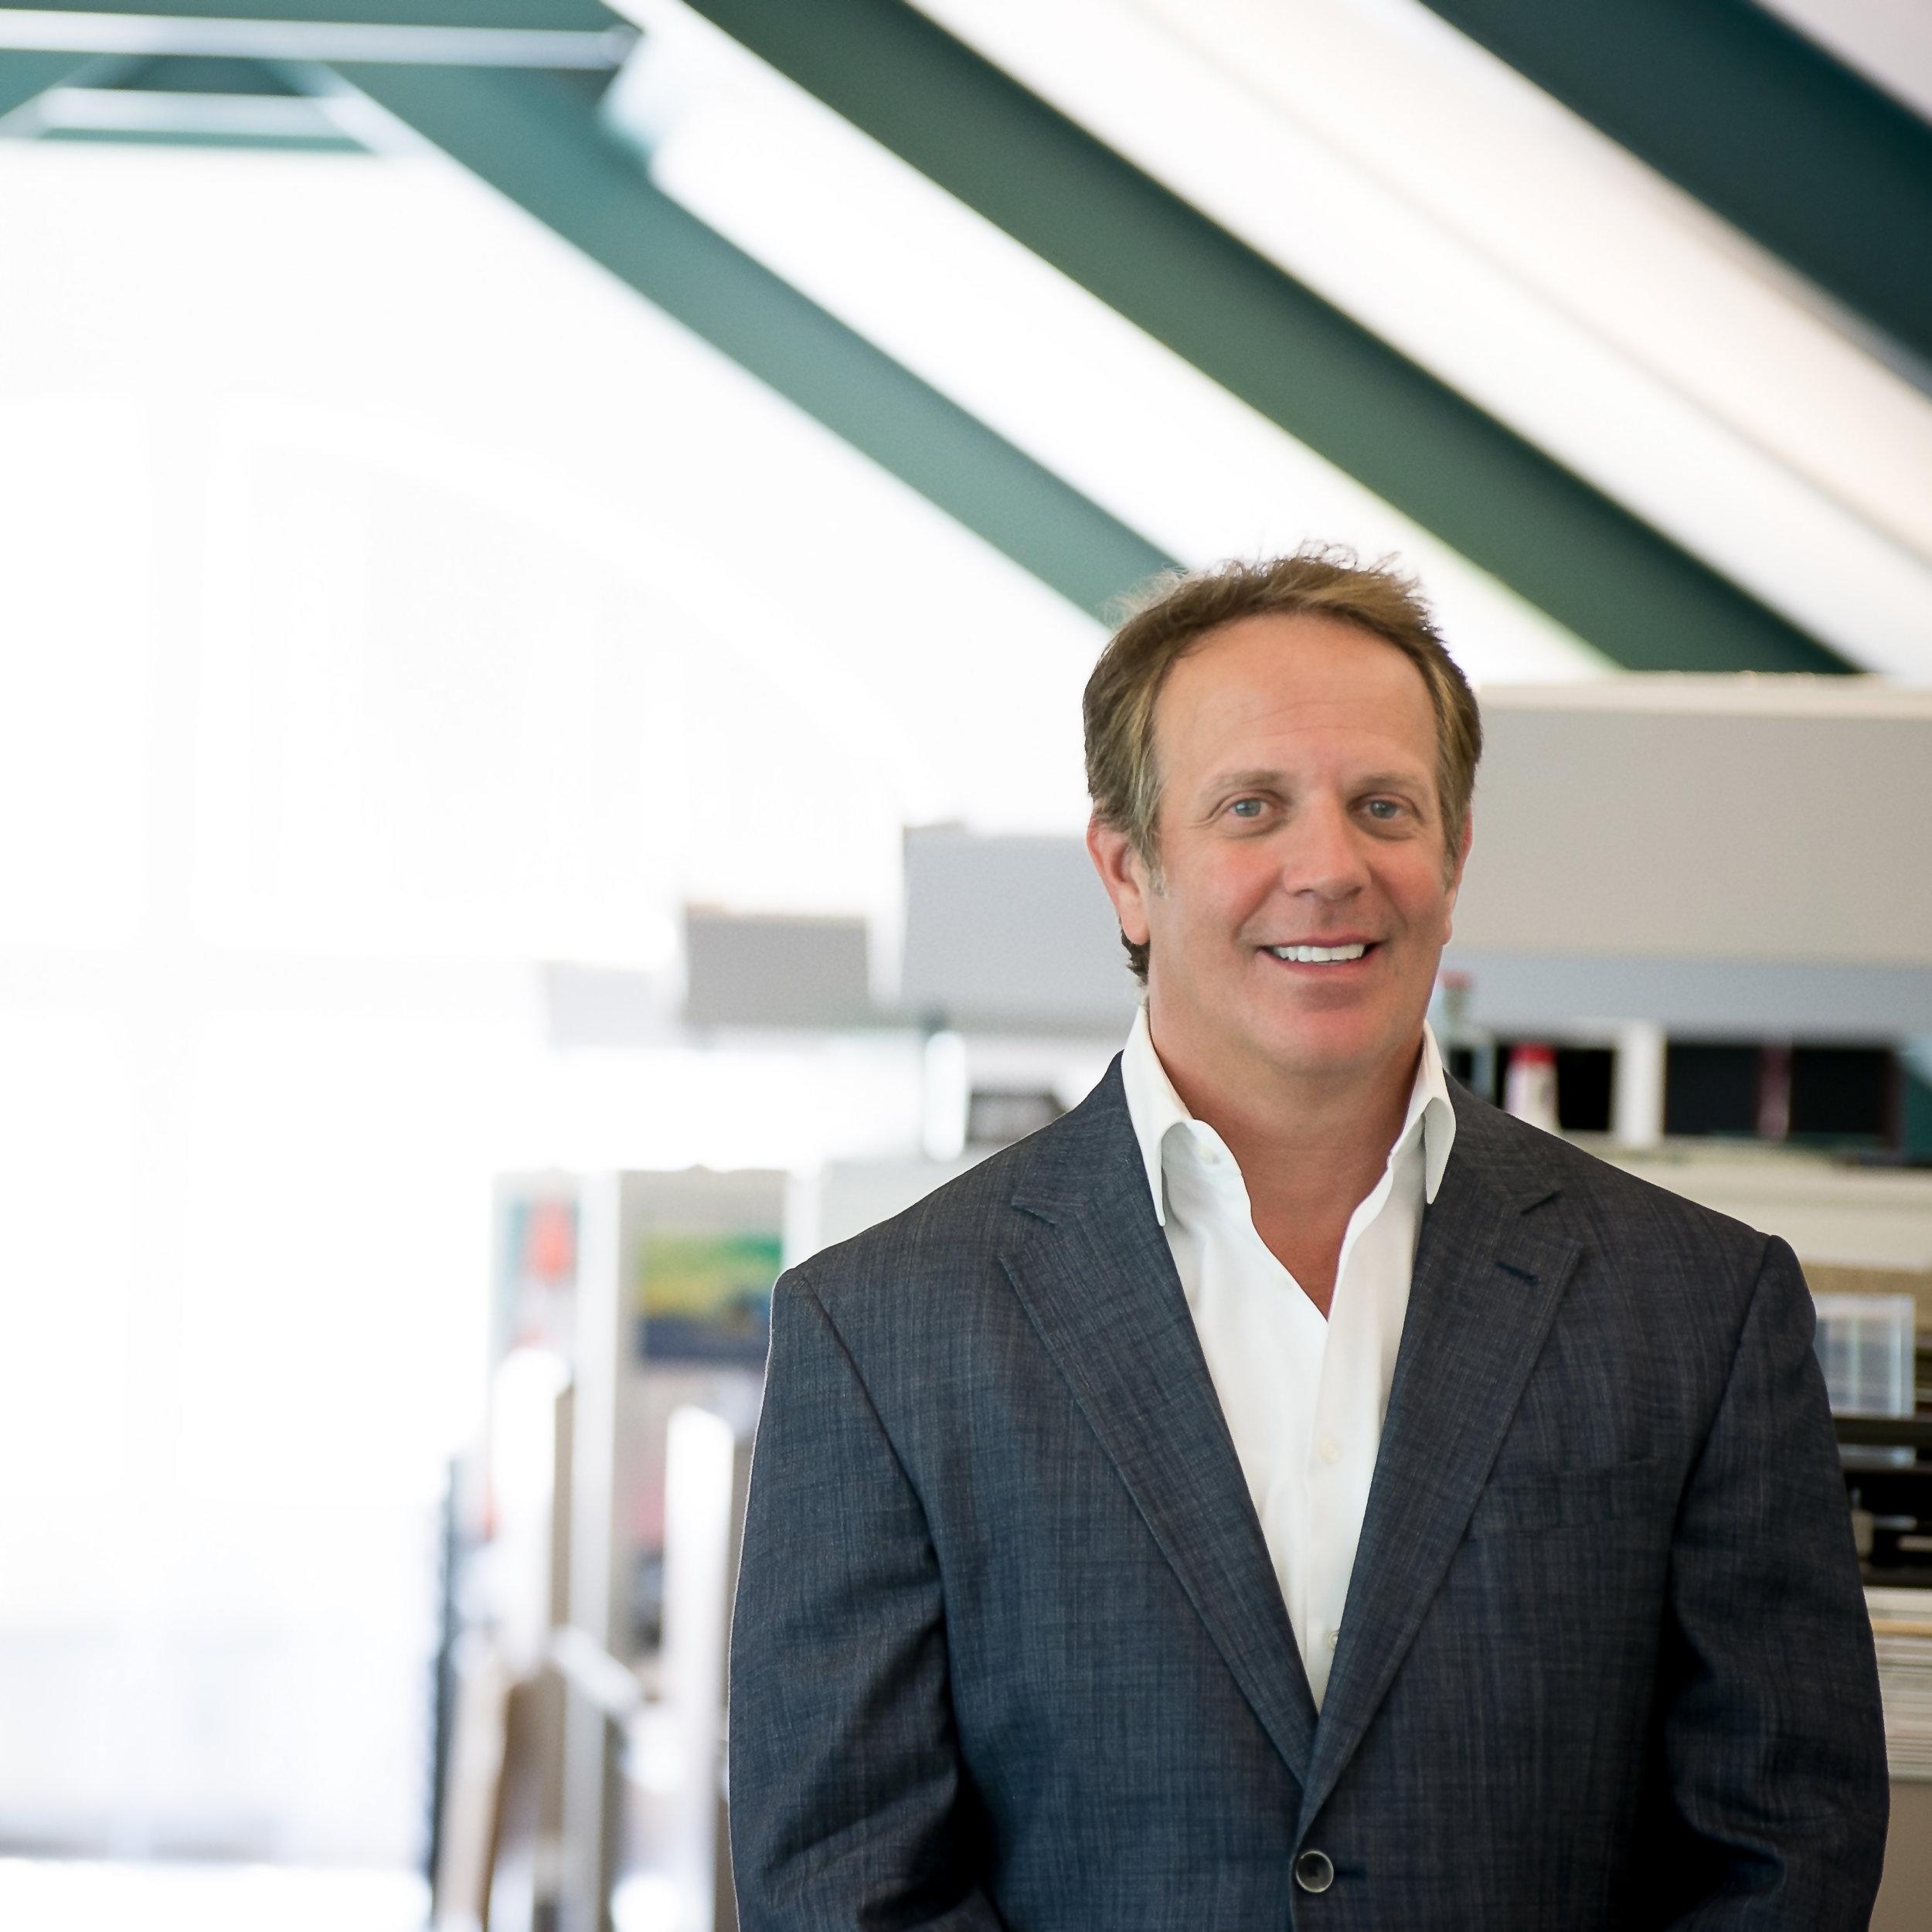 Stephen Aluotto, AIA | President & CEO